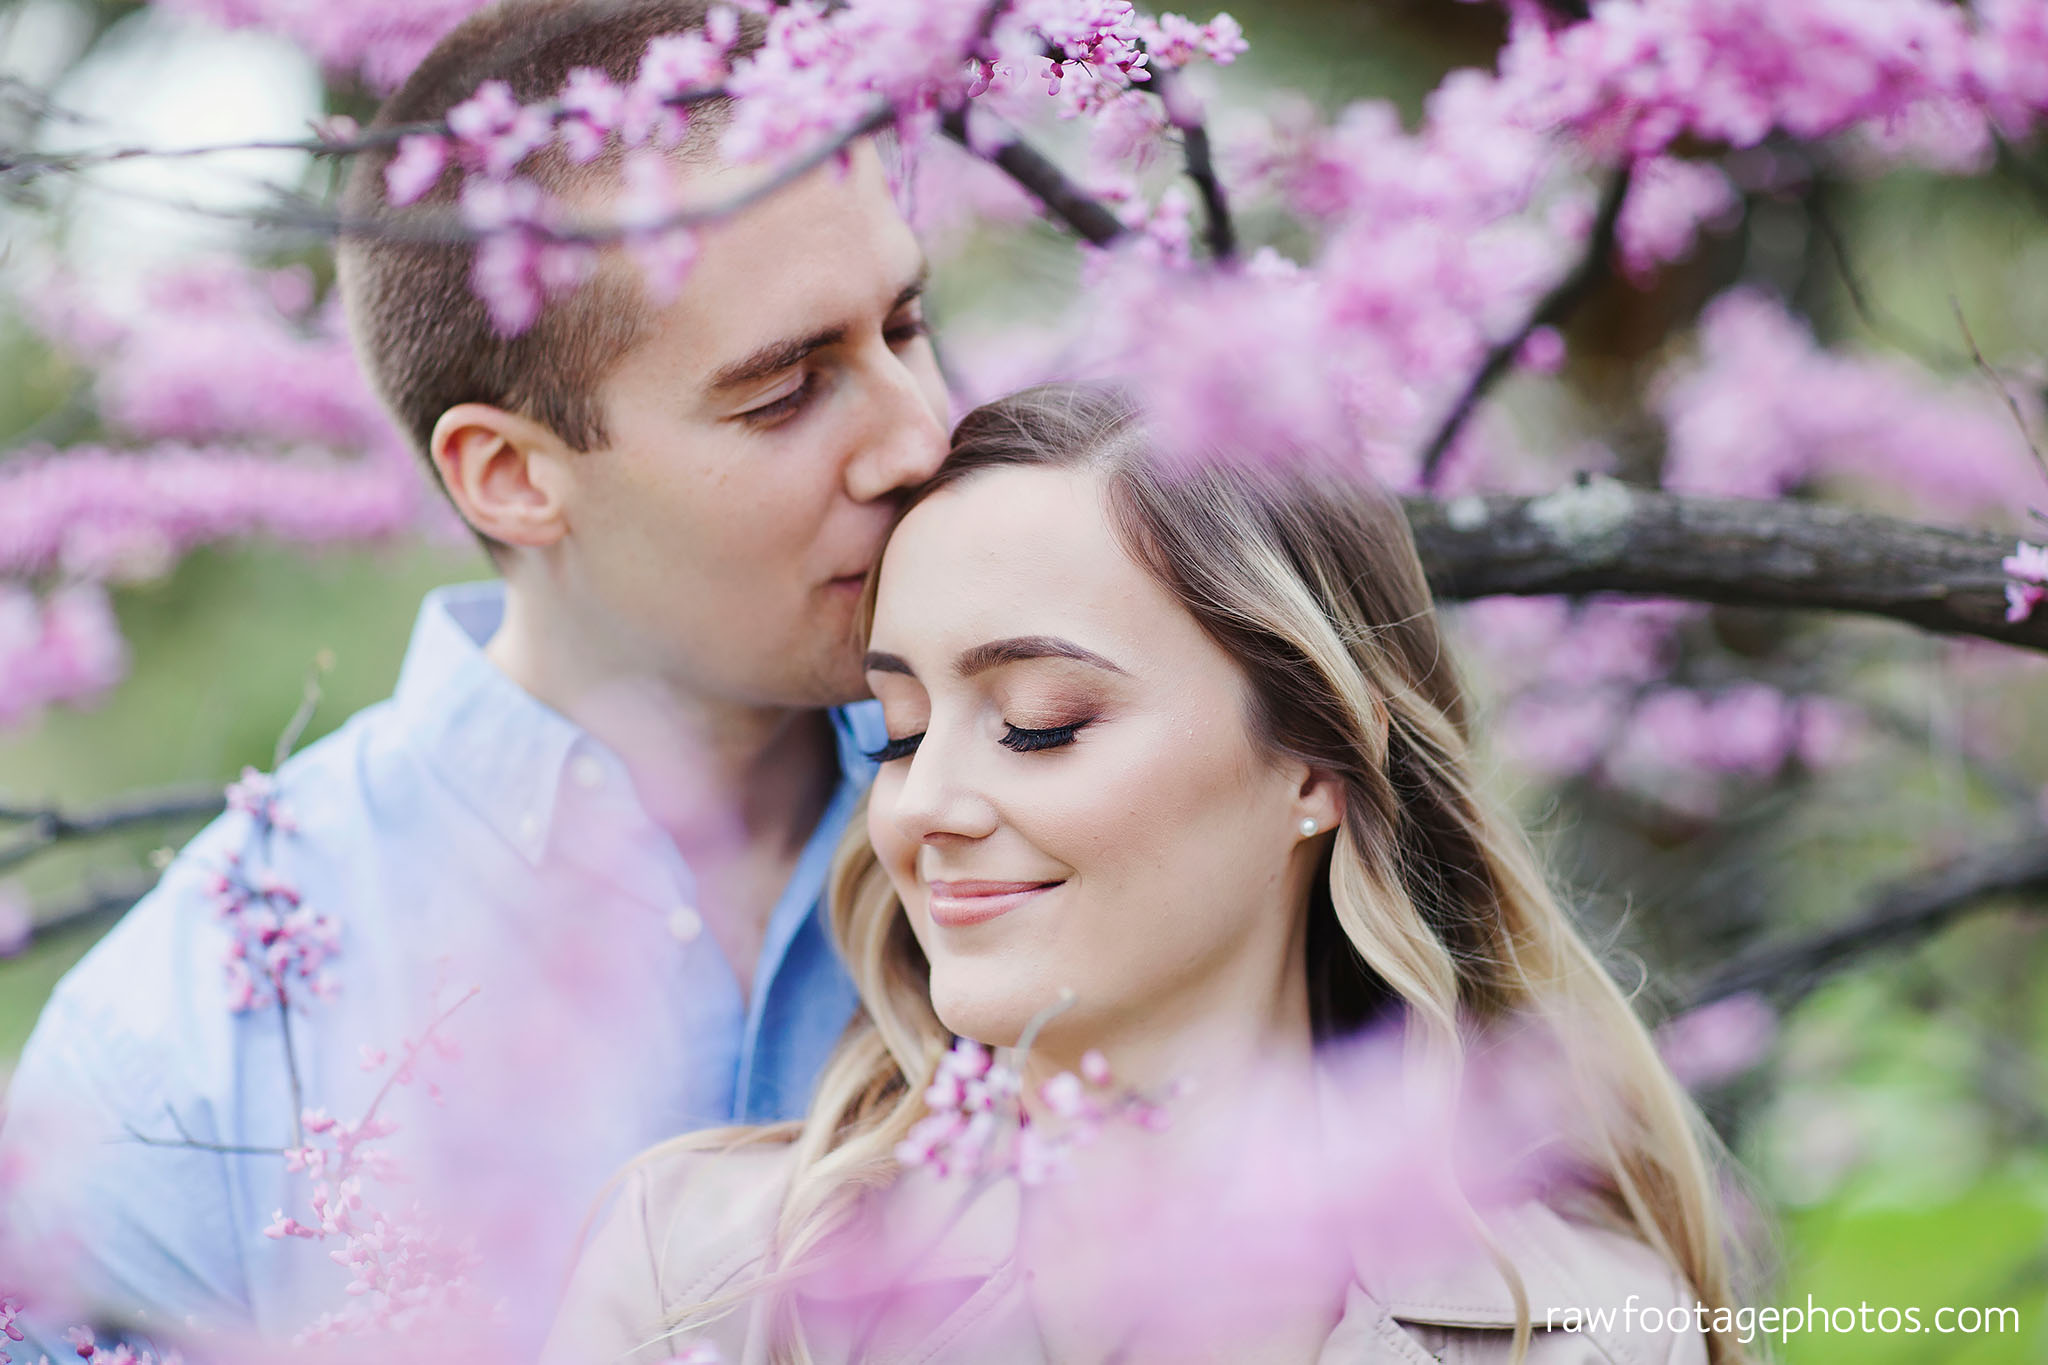 london_ontario_wedding_photographer-raw_footage_photography-engagement_session-engagement_photos-spring-blossoms-blooms011.jpg